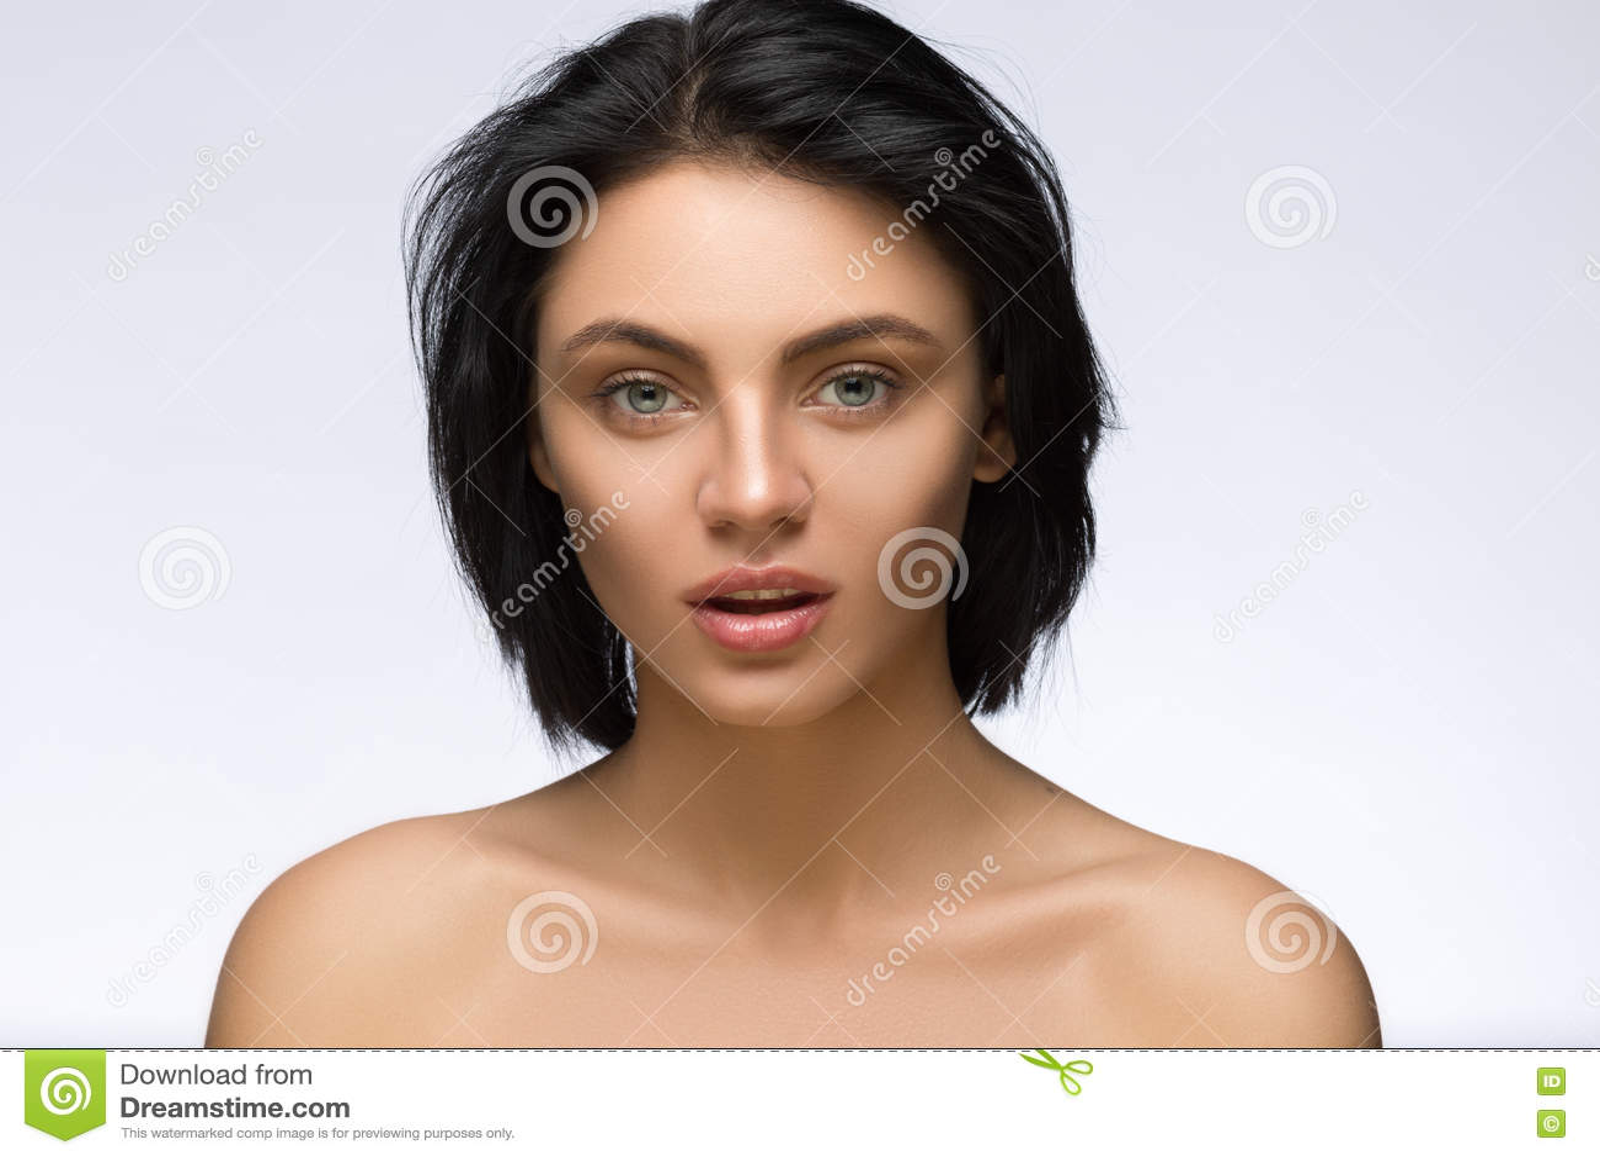 Fringe Fashion Model Girl With Trendy Hairstyle Haircut Stylish - Haircut girl model